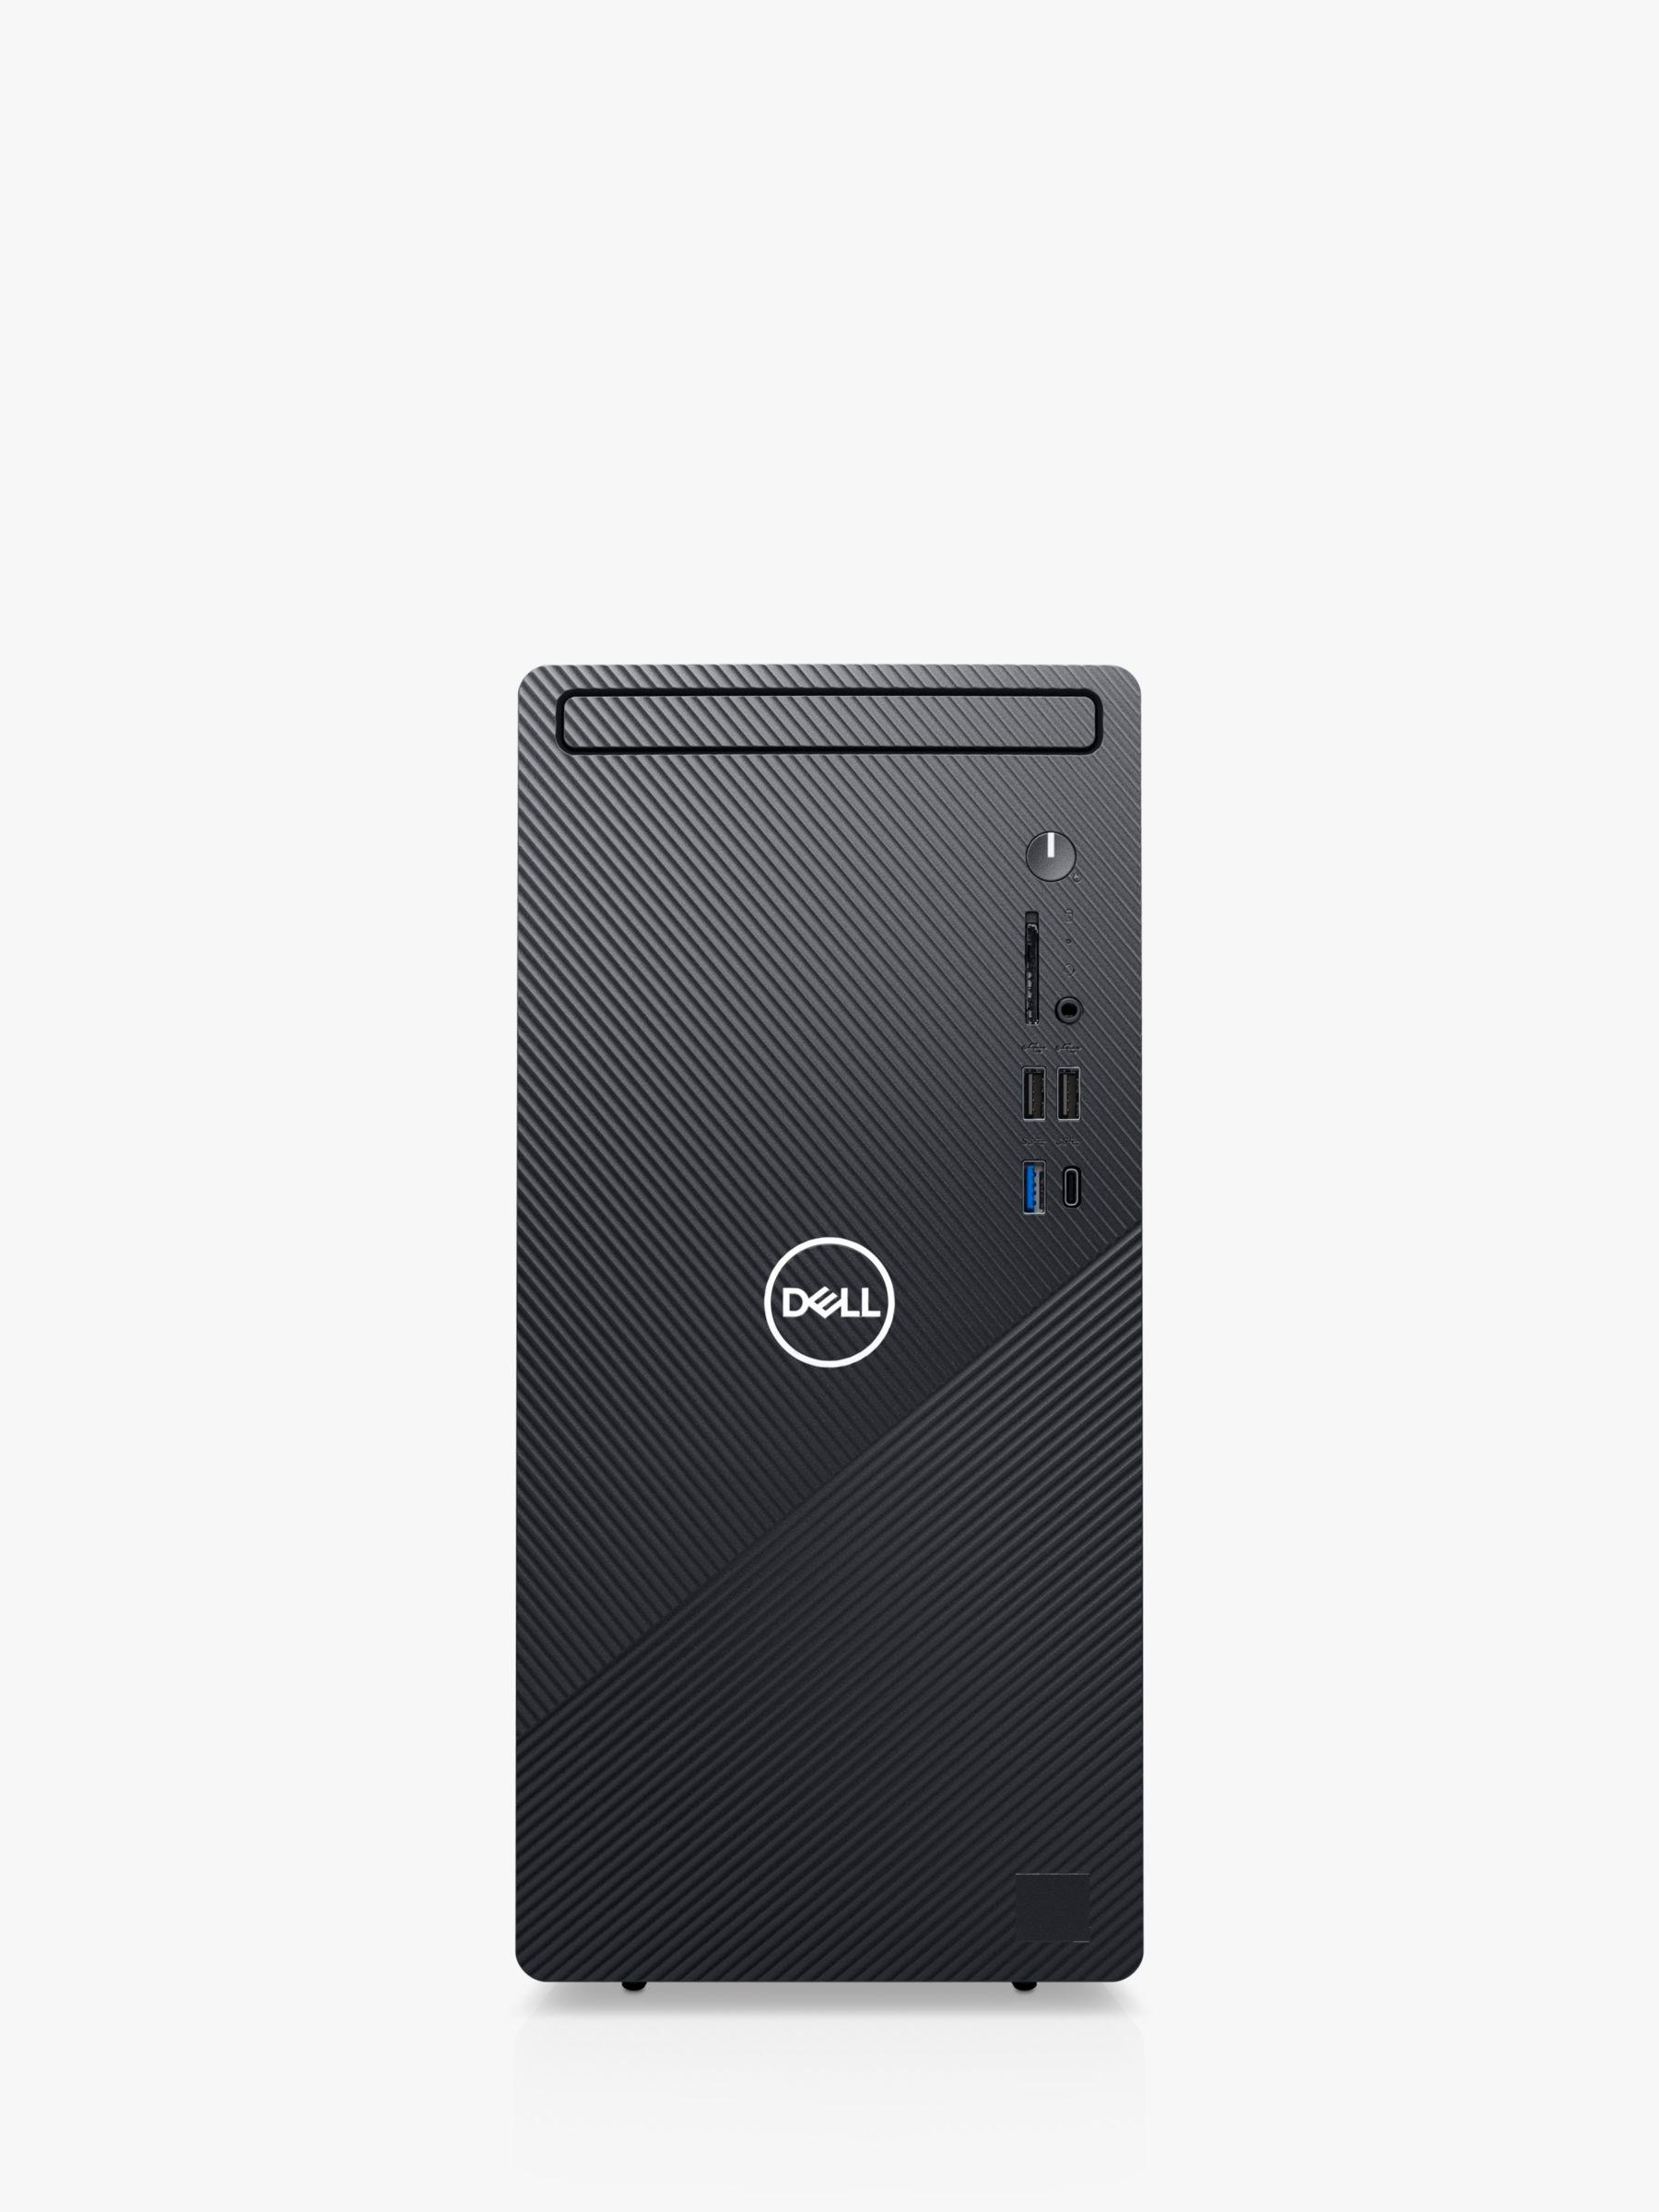 Dell Inspiron 3881 Desktop PC, Intel Core i3 Processor, 8GB RAM, 1TB HDD